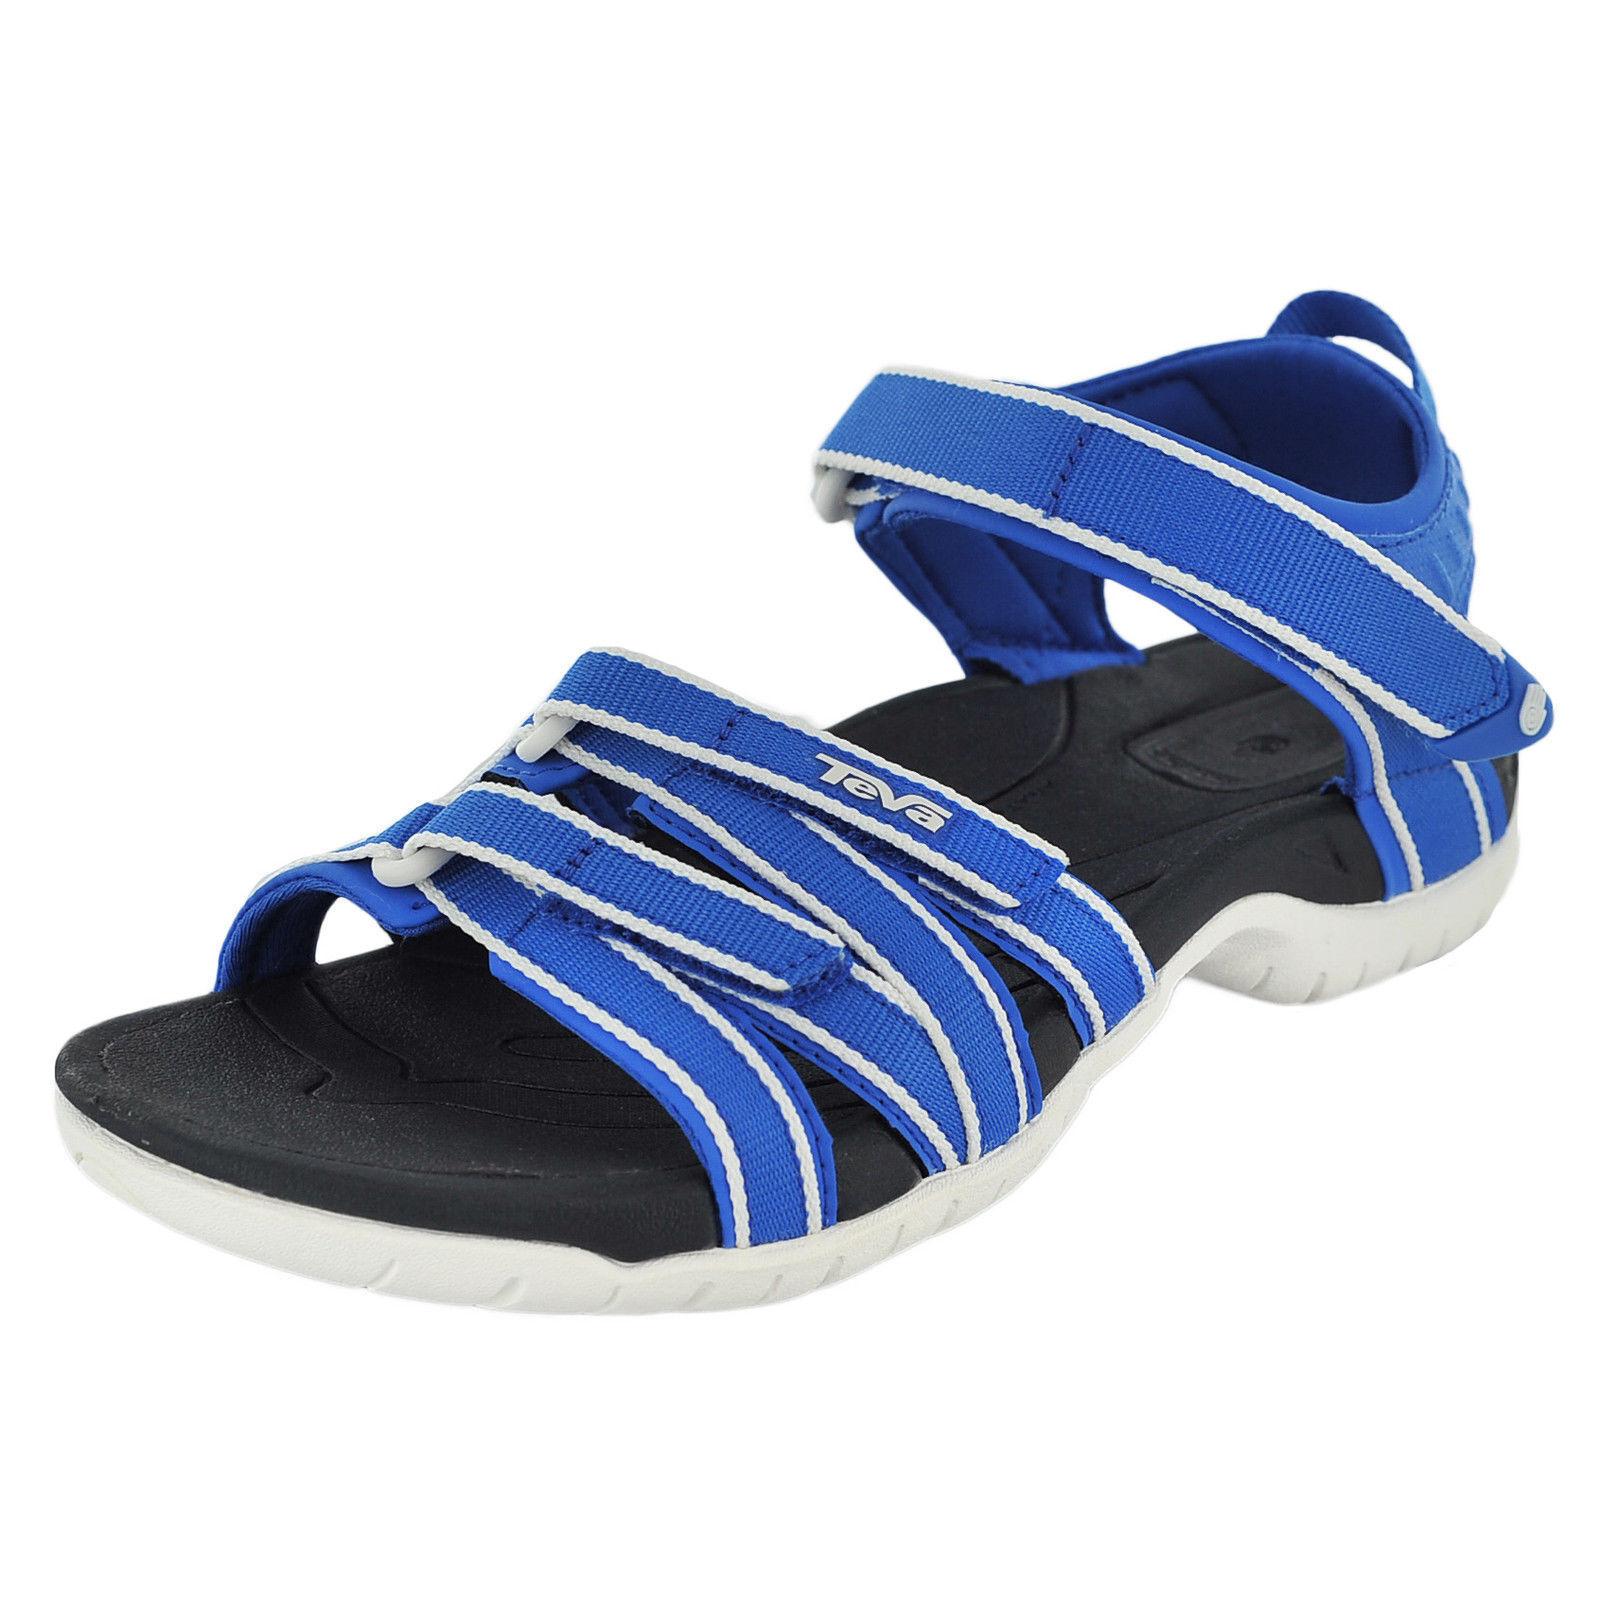 e014238bd7dc Teva Tirra 4266 Royal Blue Womens Sport Sandals Size 7m for sale ...